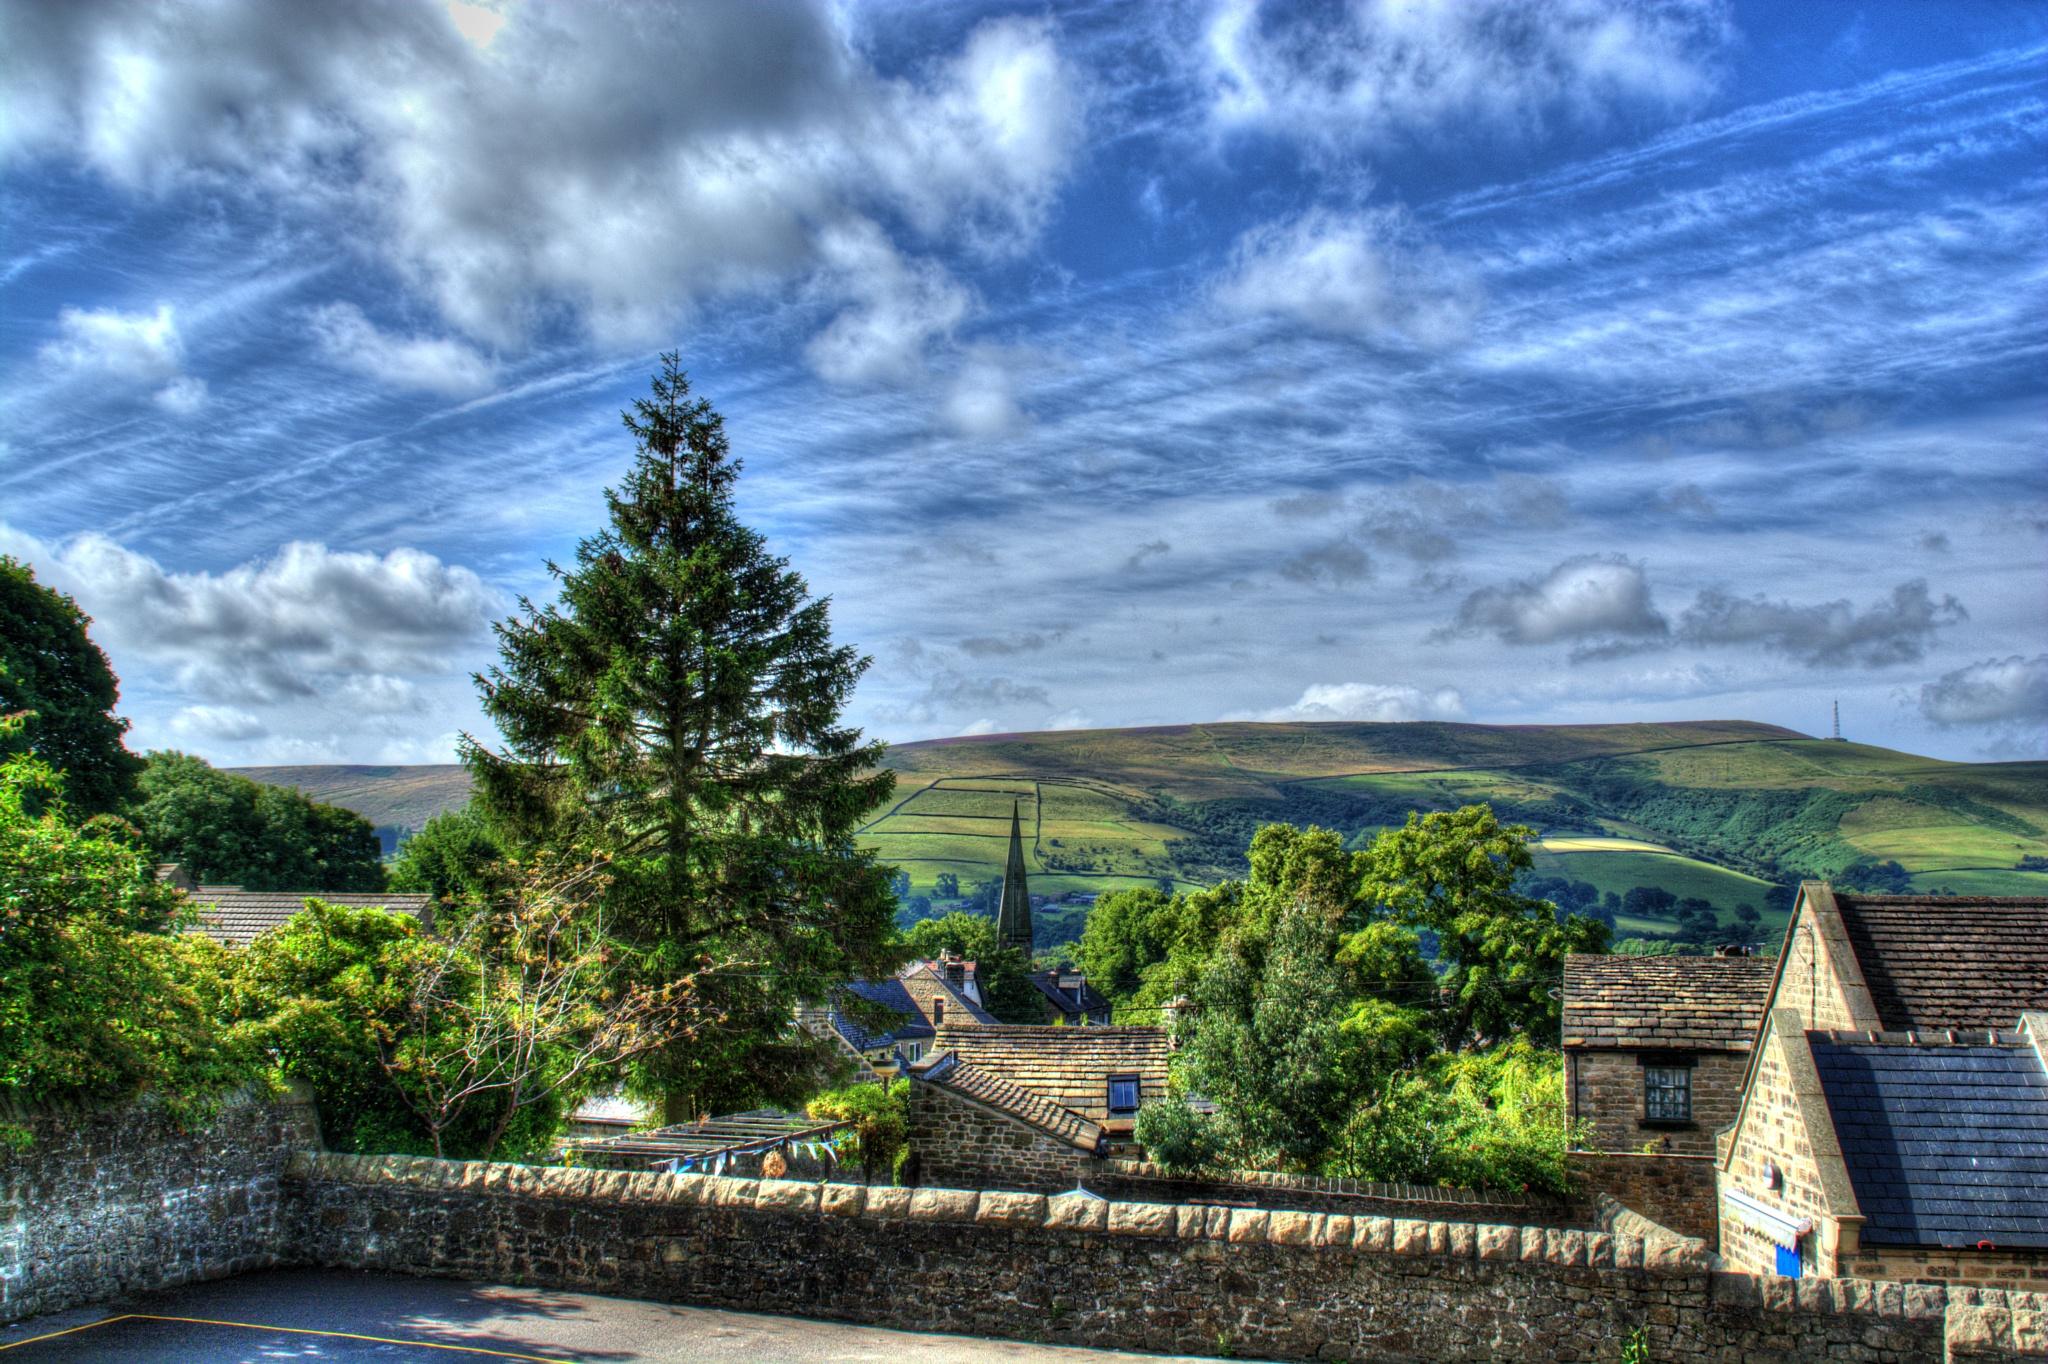 bamford derbyshire by Stuart Robertshaw Photography